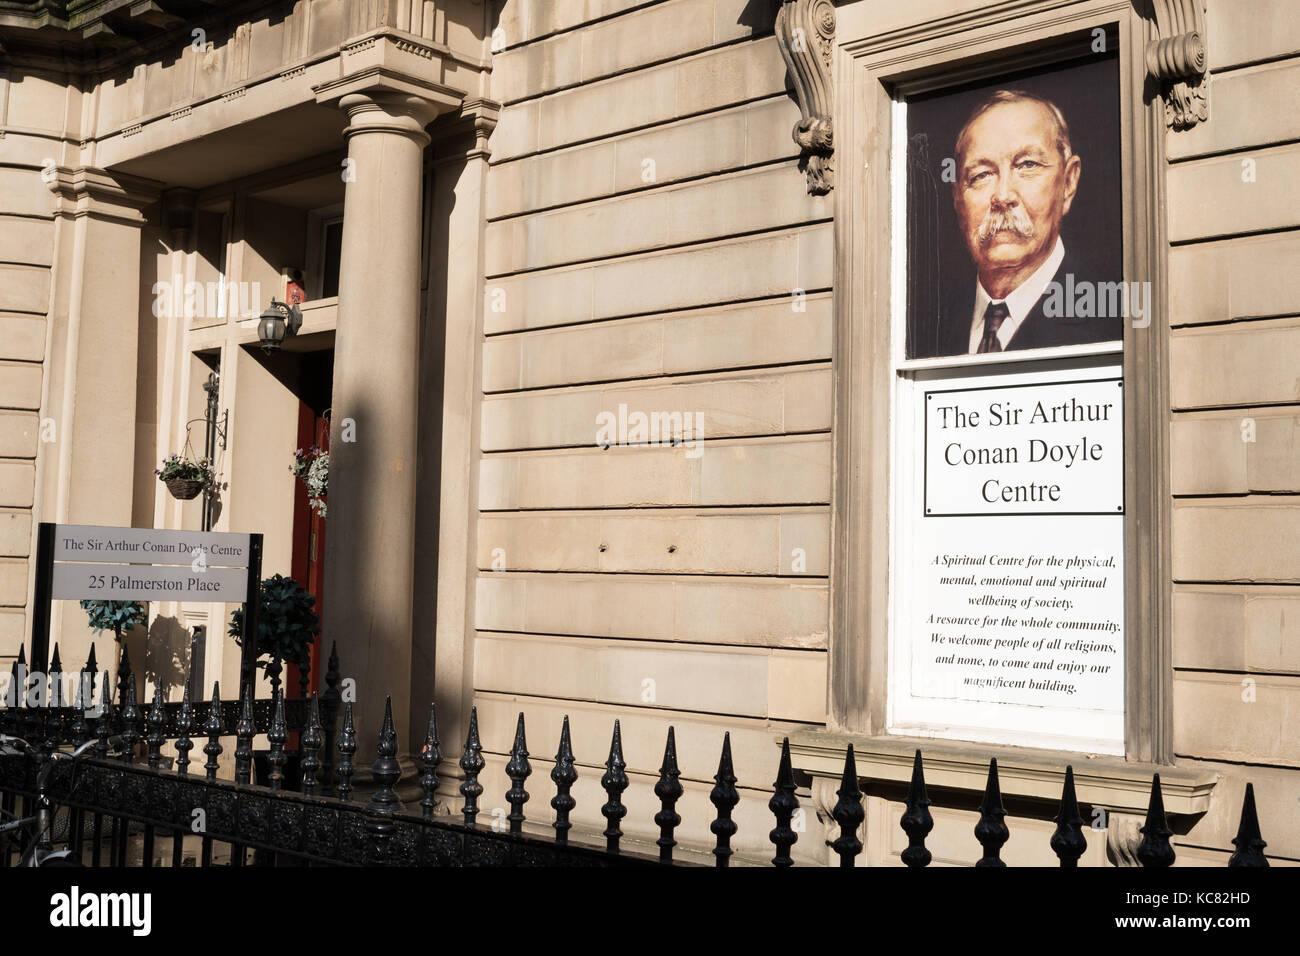 The Sir Arthur Conan Doyle Centre, and Edinburgh Association of Spiritualists,  Edinburgh, Scotland, UK - Stock Image